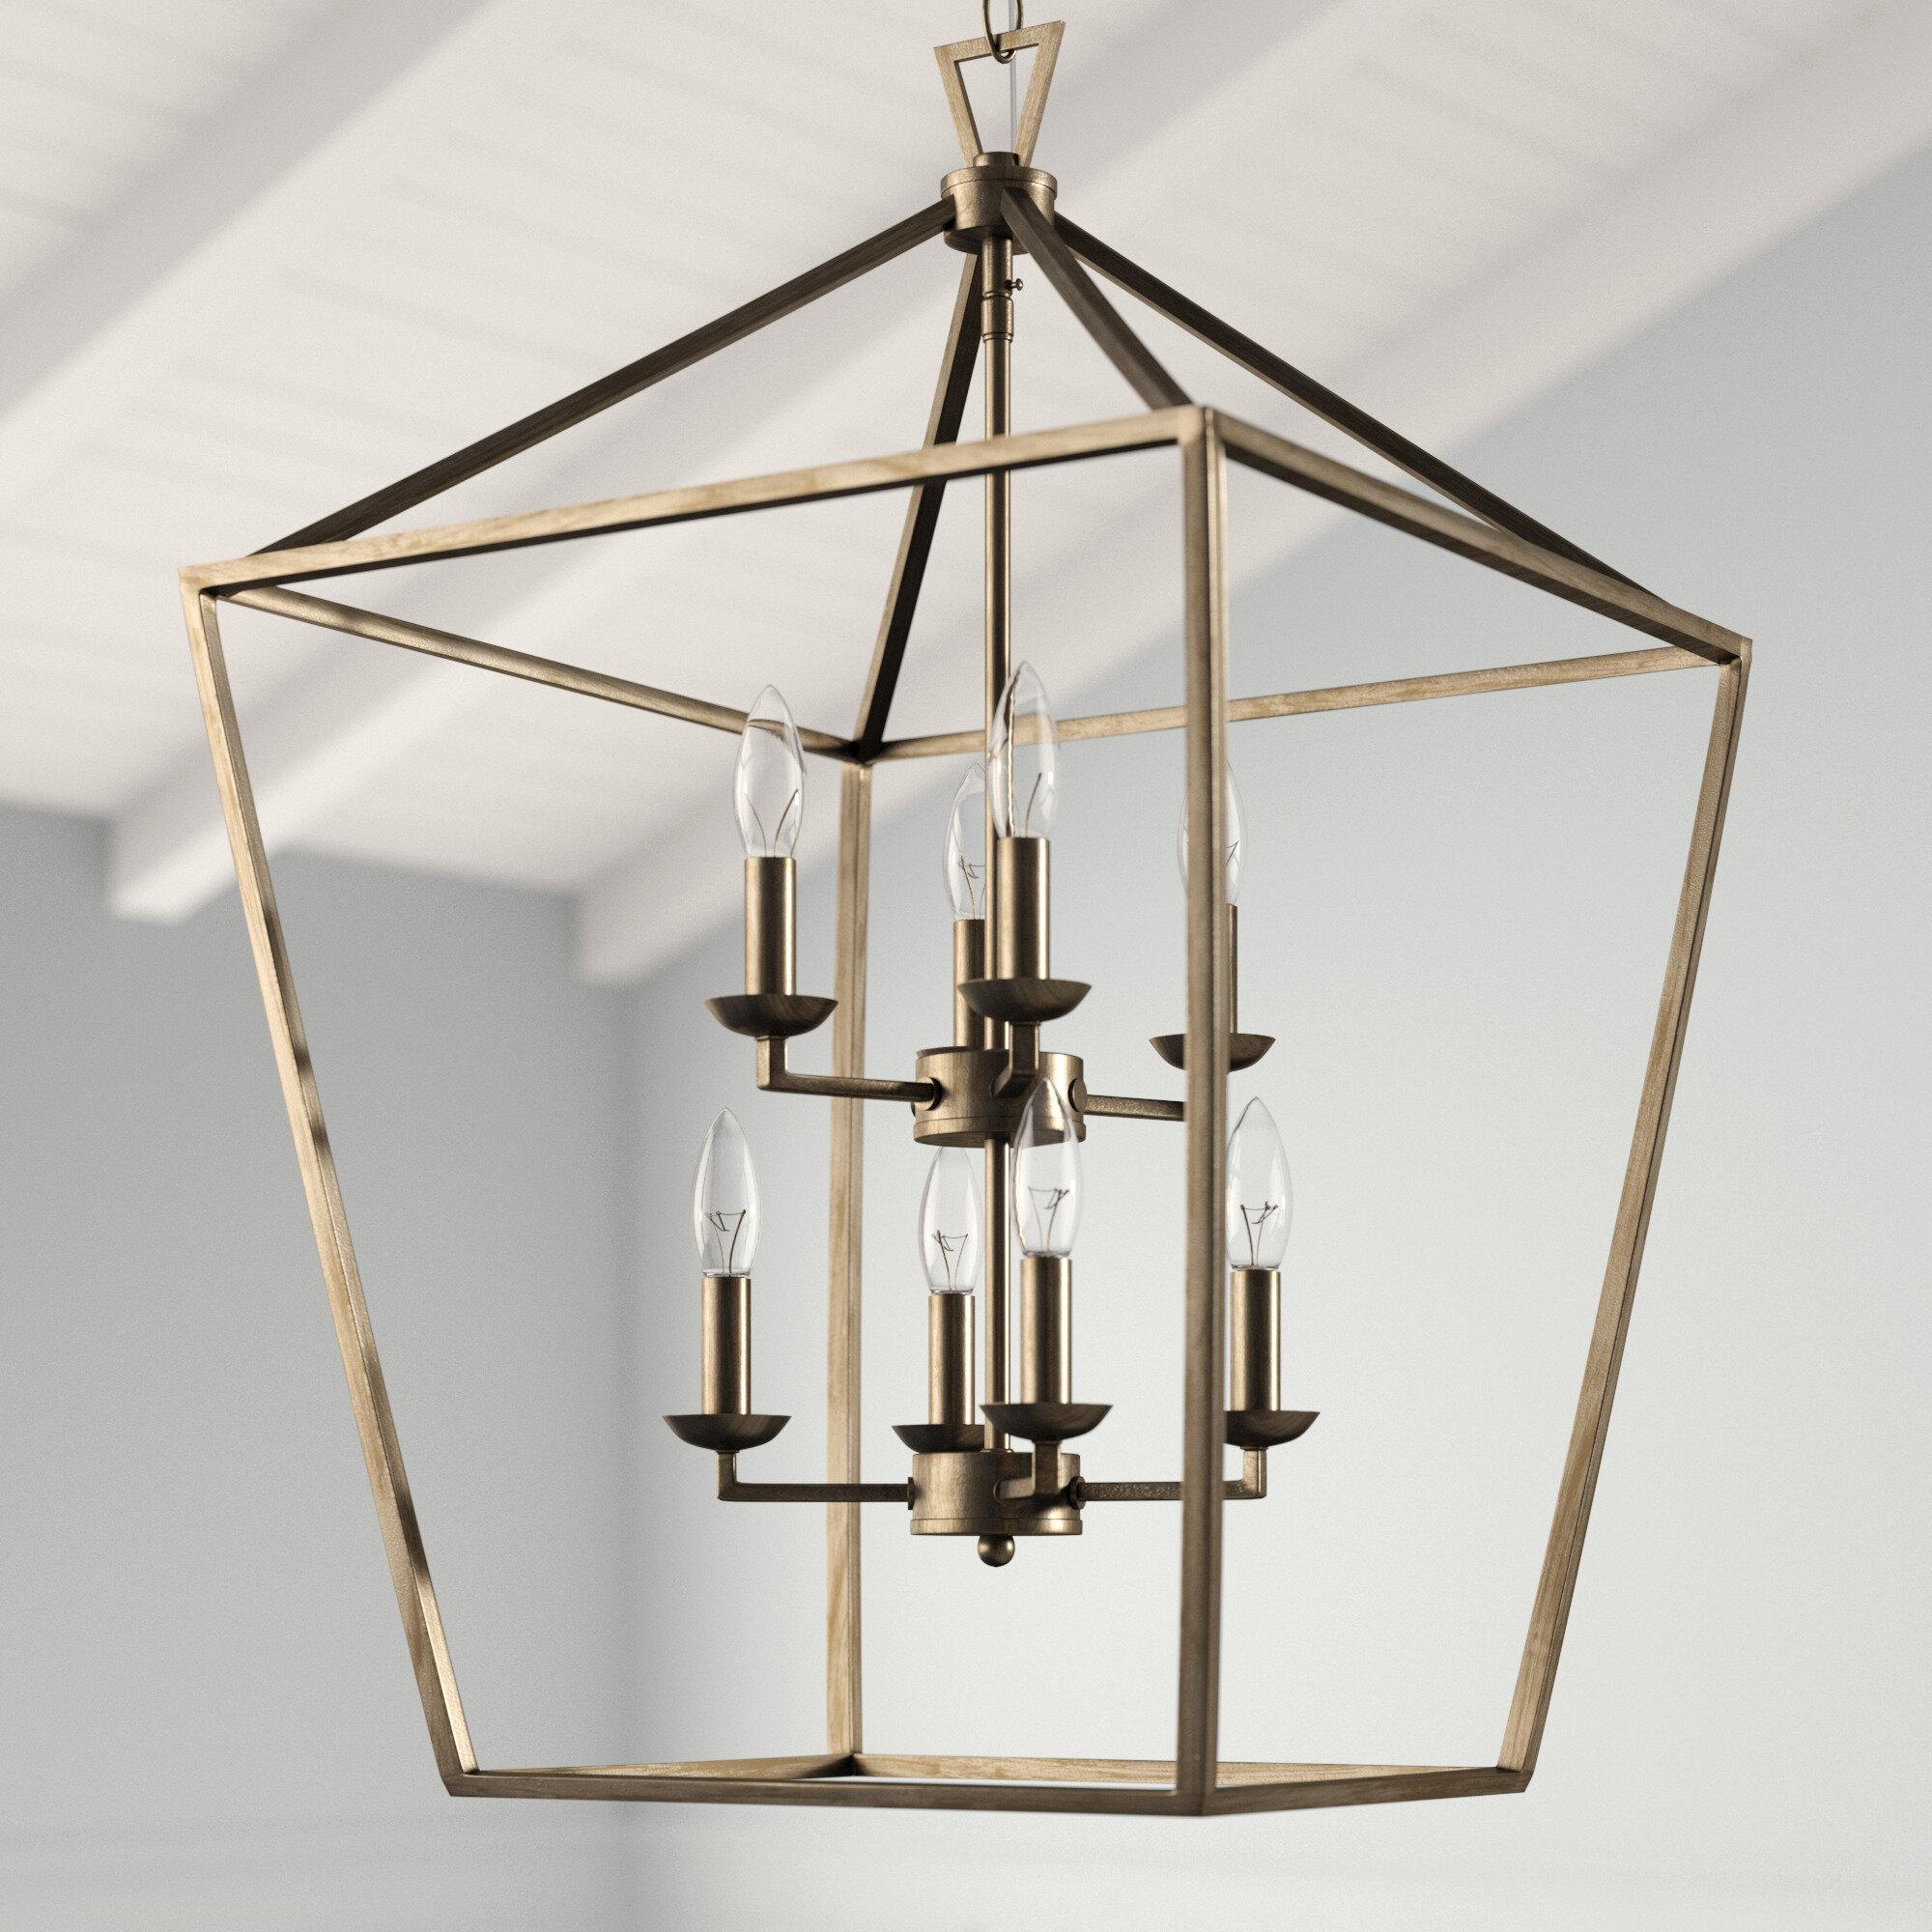 Carmen 8-Light Lantern Geometric Pendant in Carmen 8-Light Lantern Tiered Pendants (Image 11 of 30)